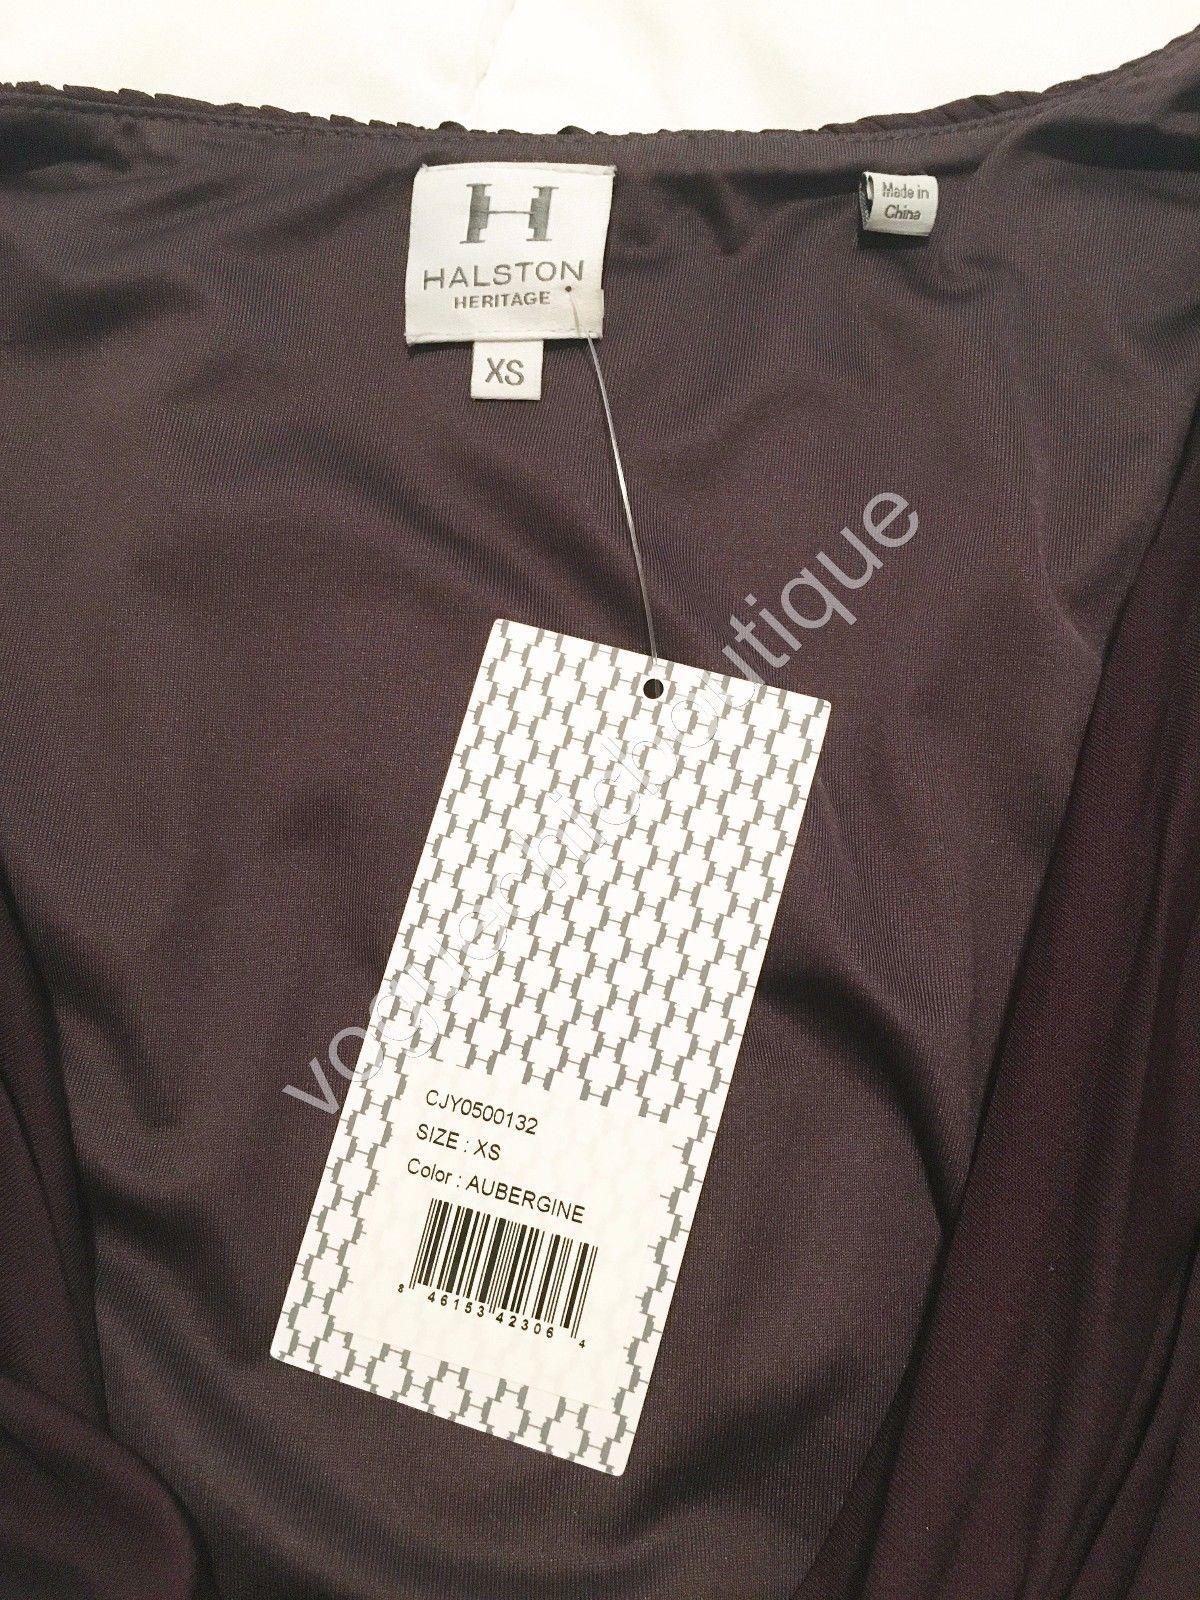 NWT Halston Heritage Ruched Jersey Mini Bodycon Dress Purple Aubergine XS 0 2 image 10